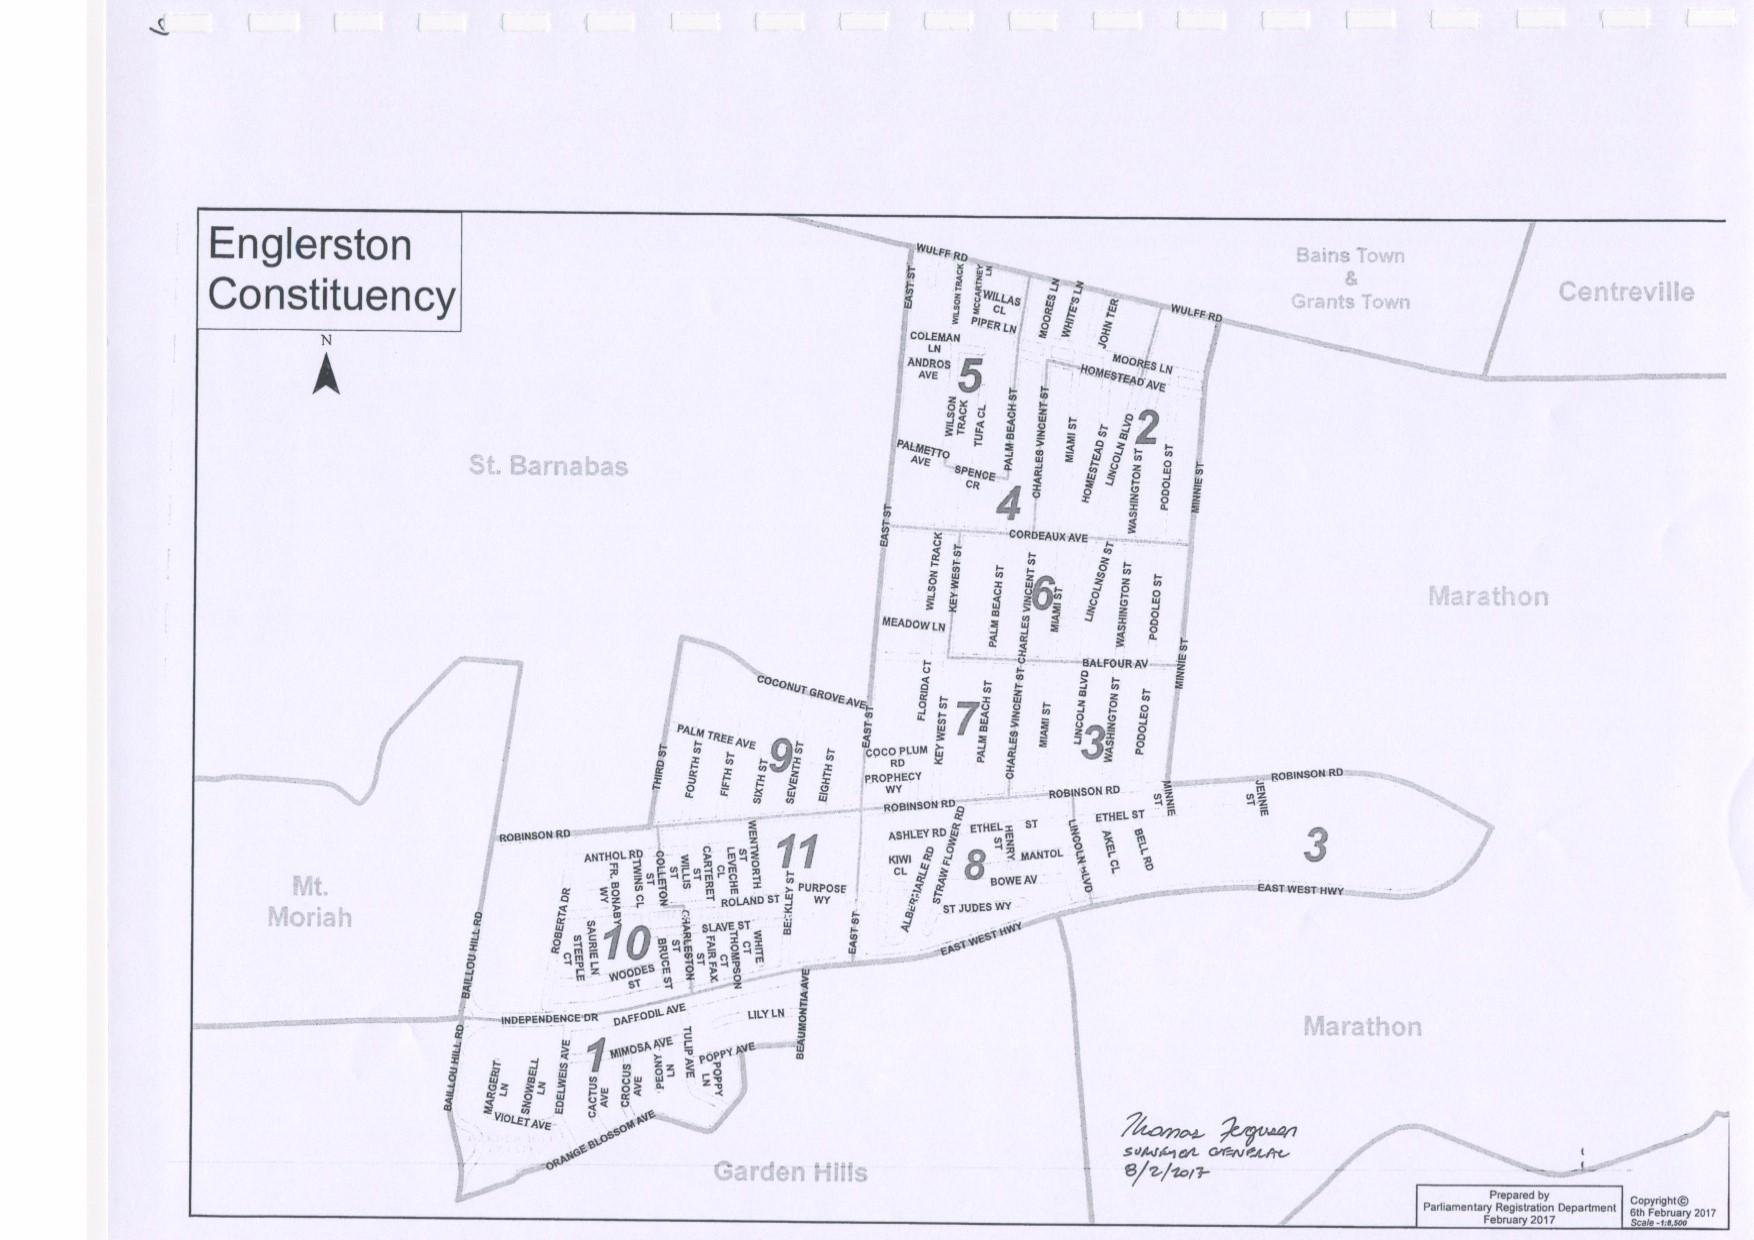 Englerston Constituency 2017